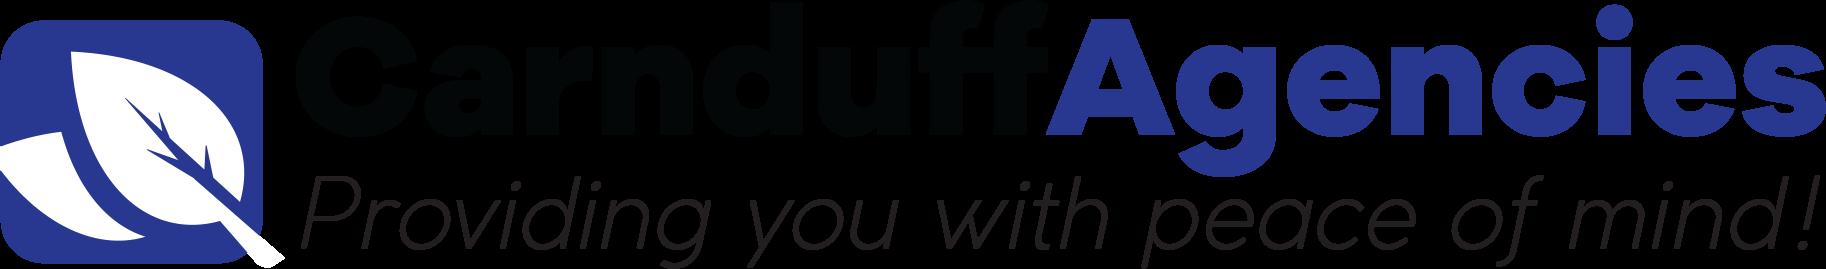 Carnduff Agencies Inc.